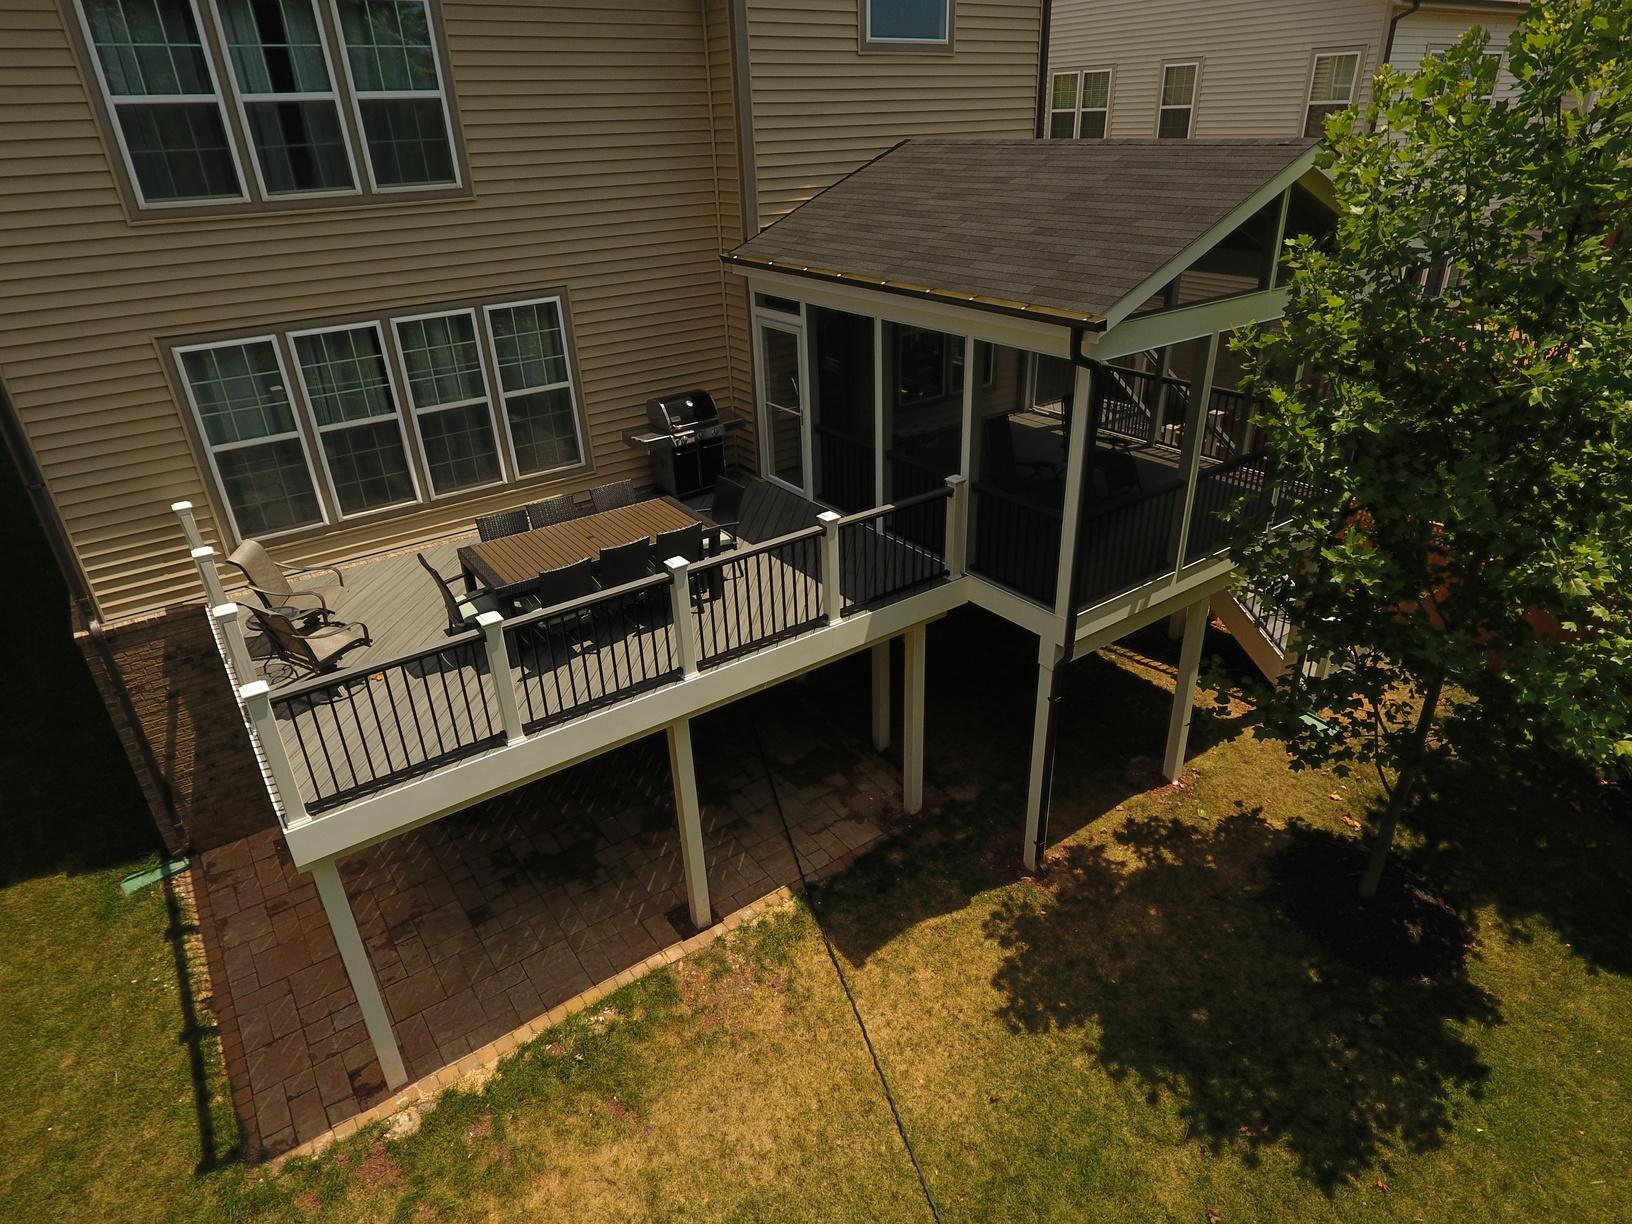 Modern Deck and Porch Installation in Ashburn, Va